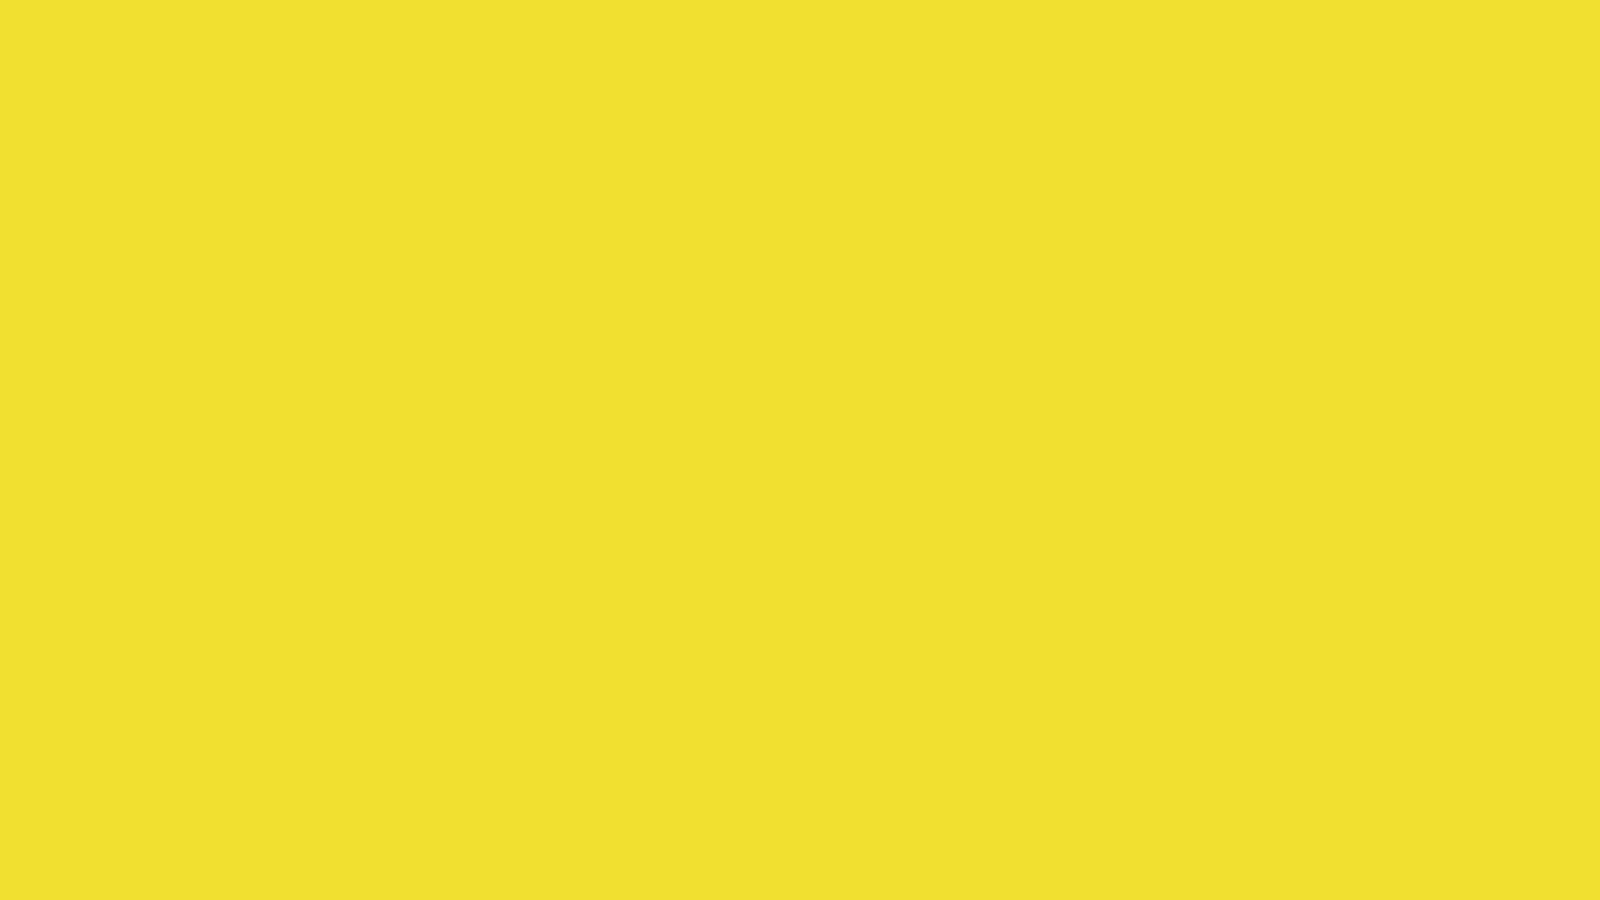 1600x900 Dandelion Solid Color Background